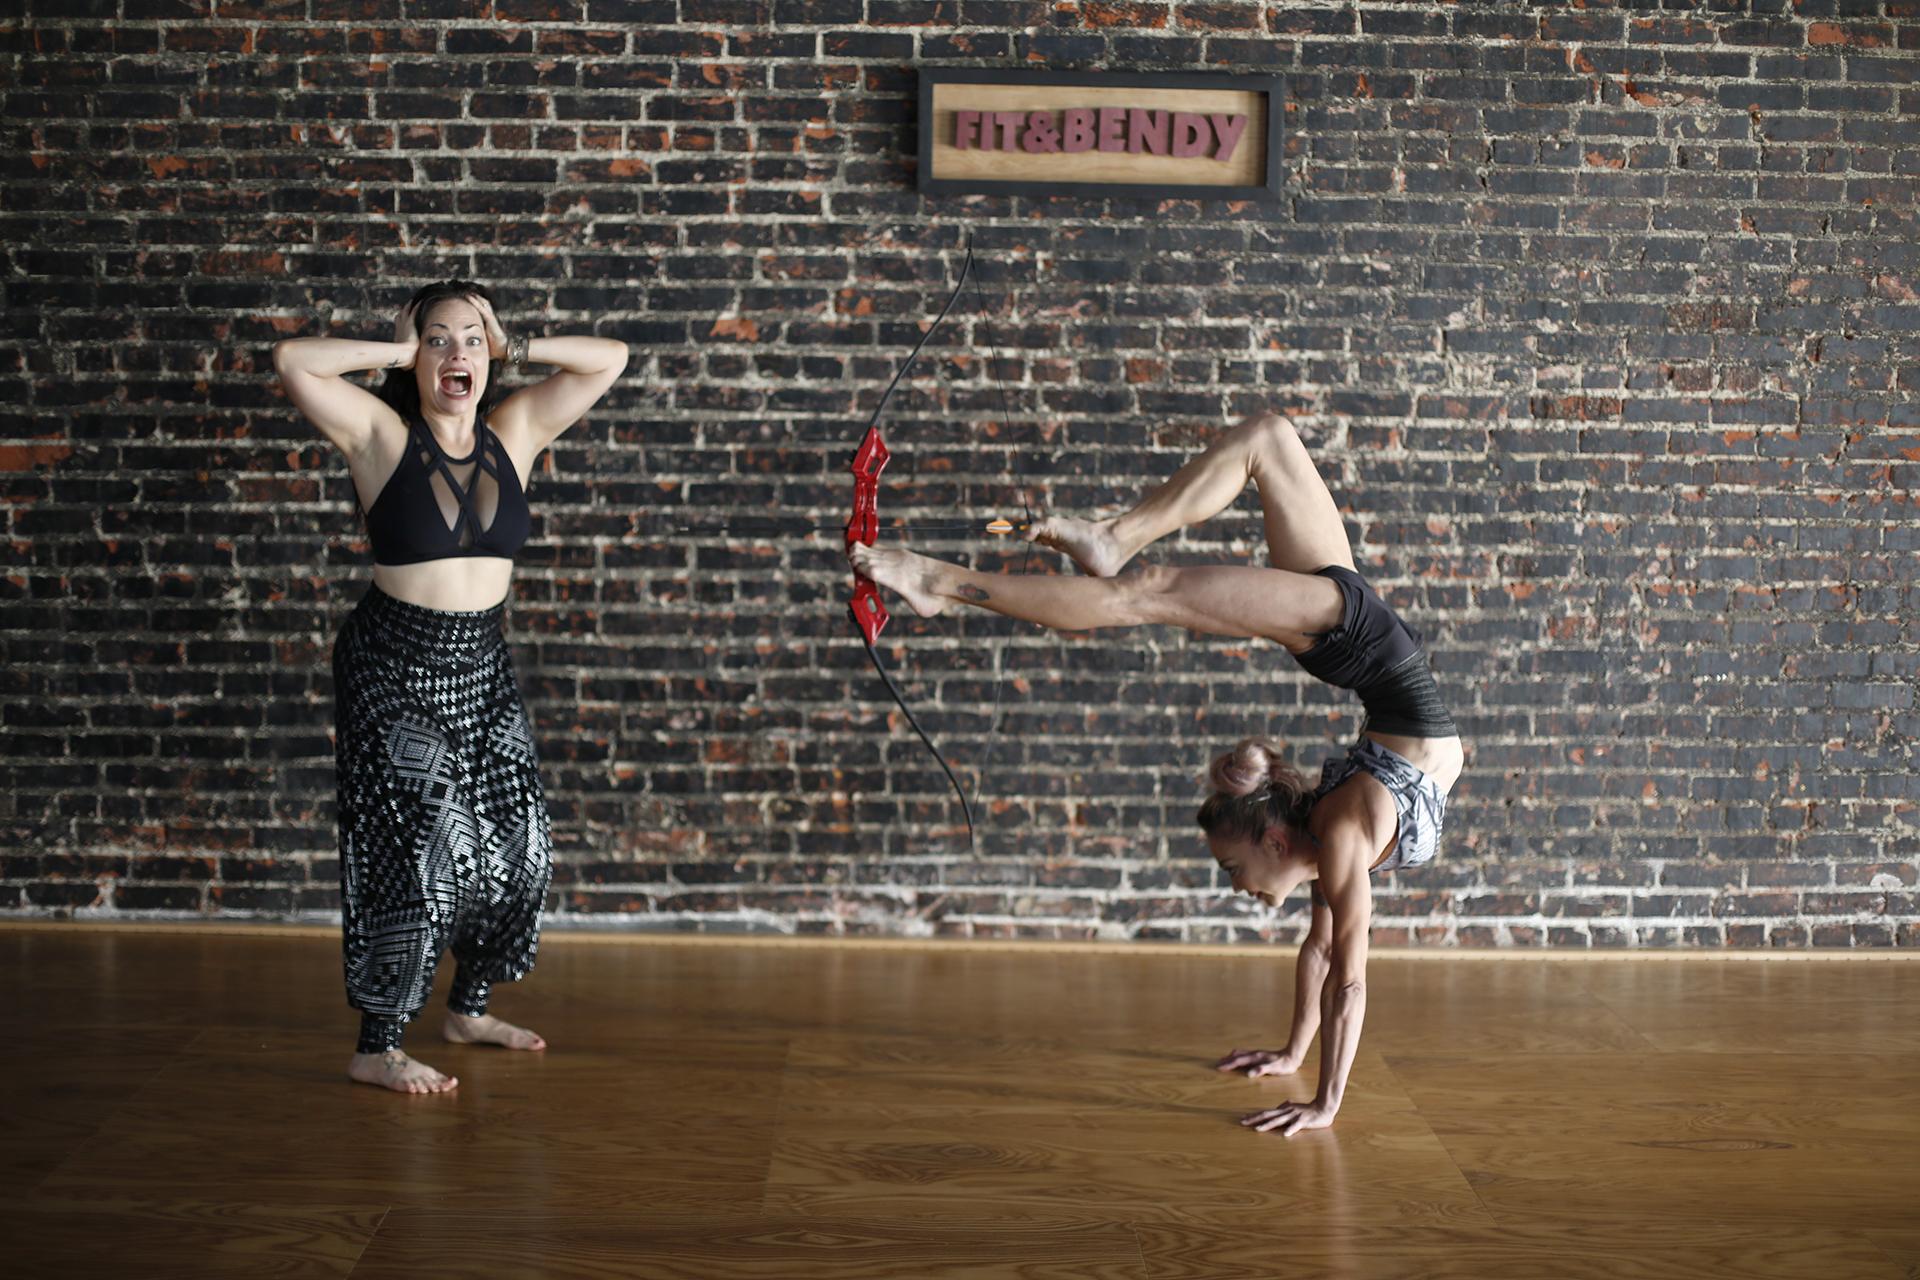 Kristina Nekyia Bow Arrow Contortion Women Studio Brick Wall Wood Floor Screaming Fit and Bendy